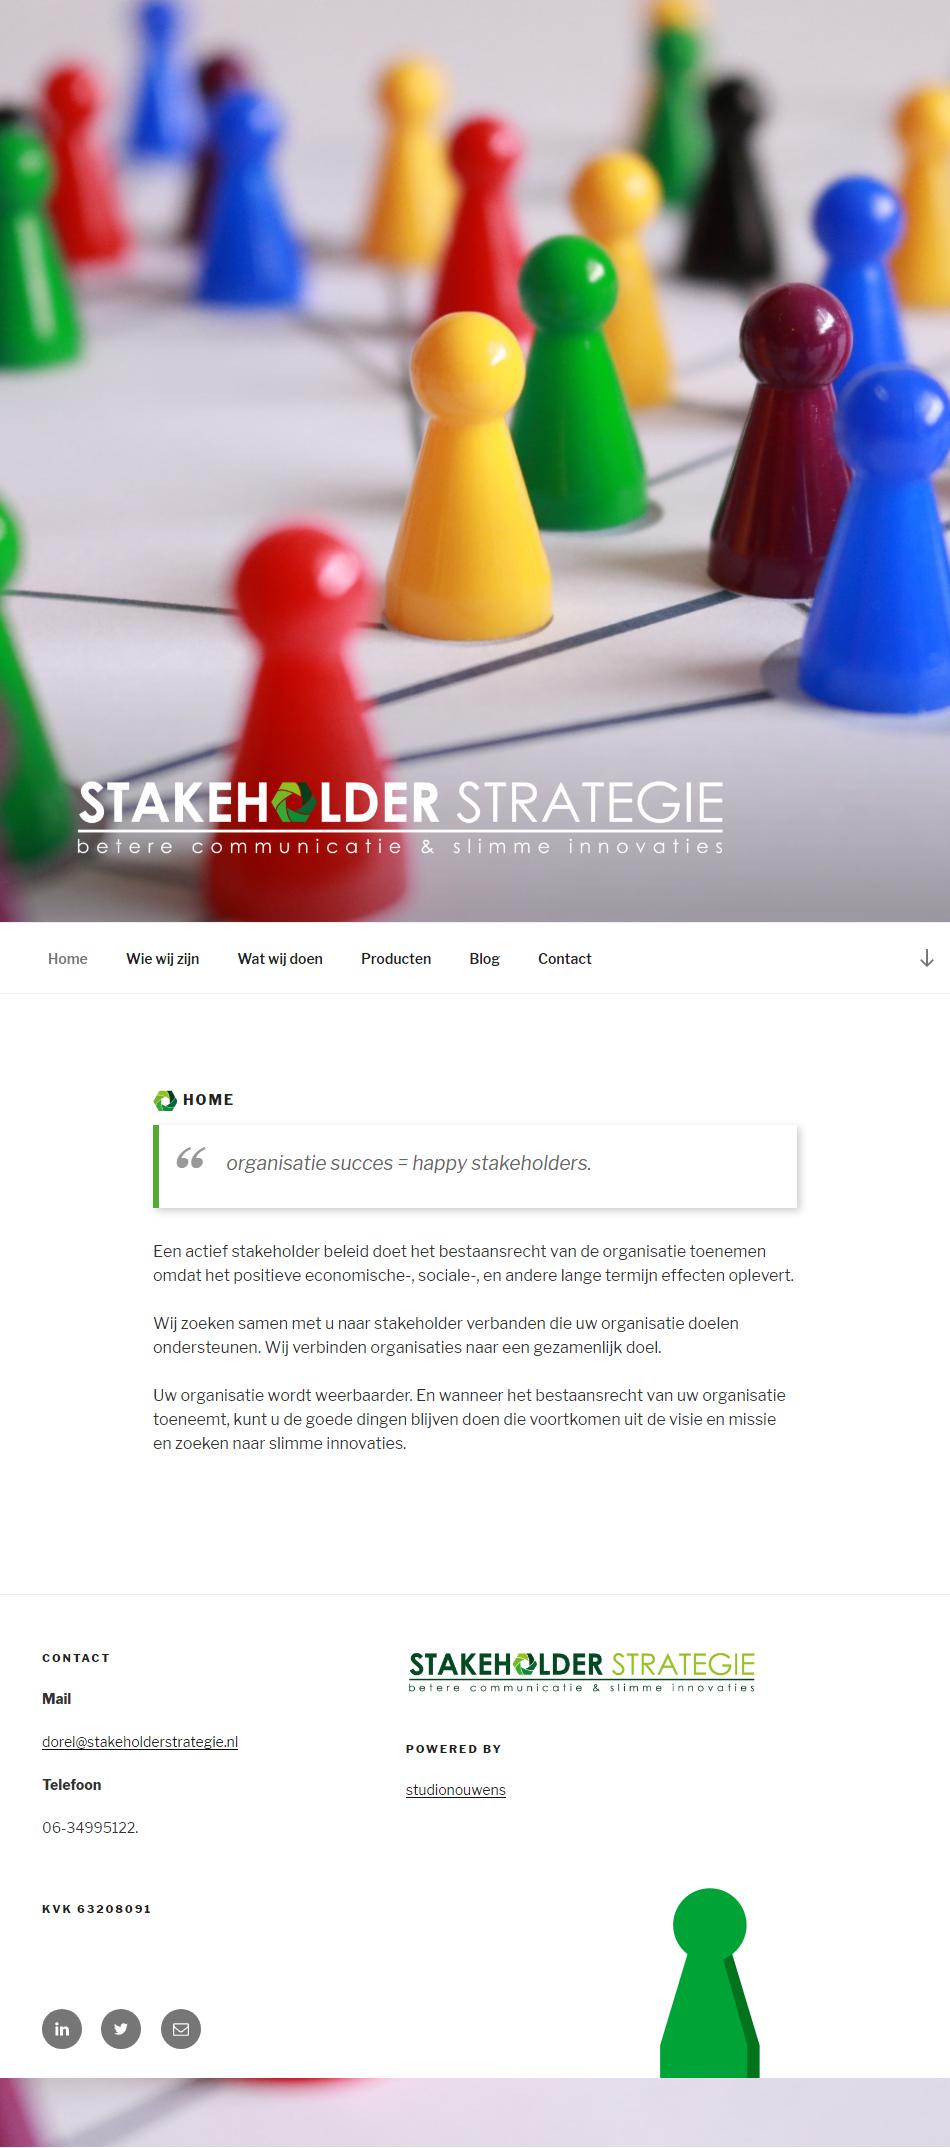 Stakeholder strategie